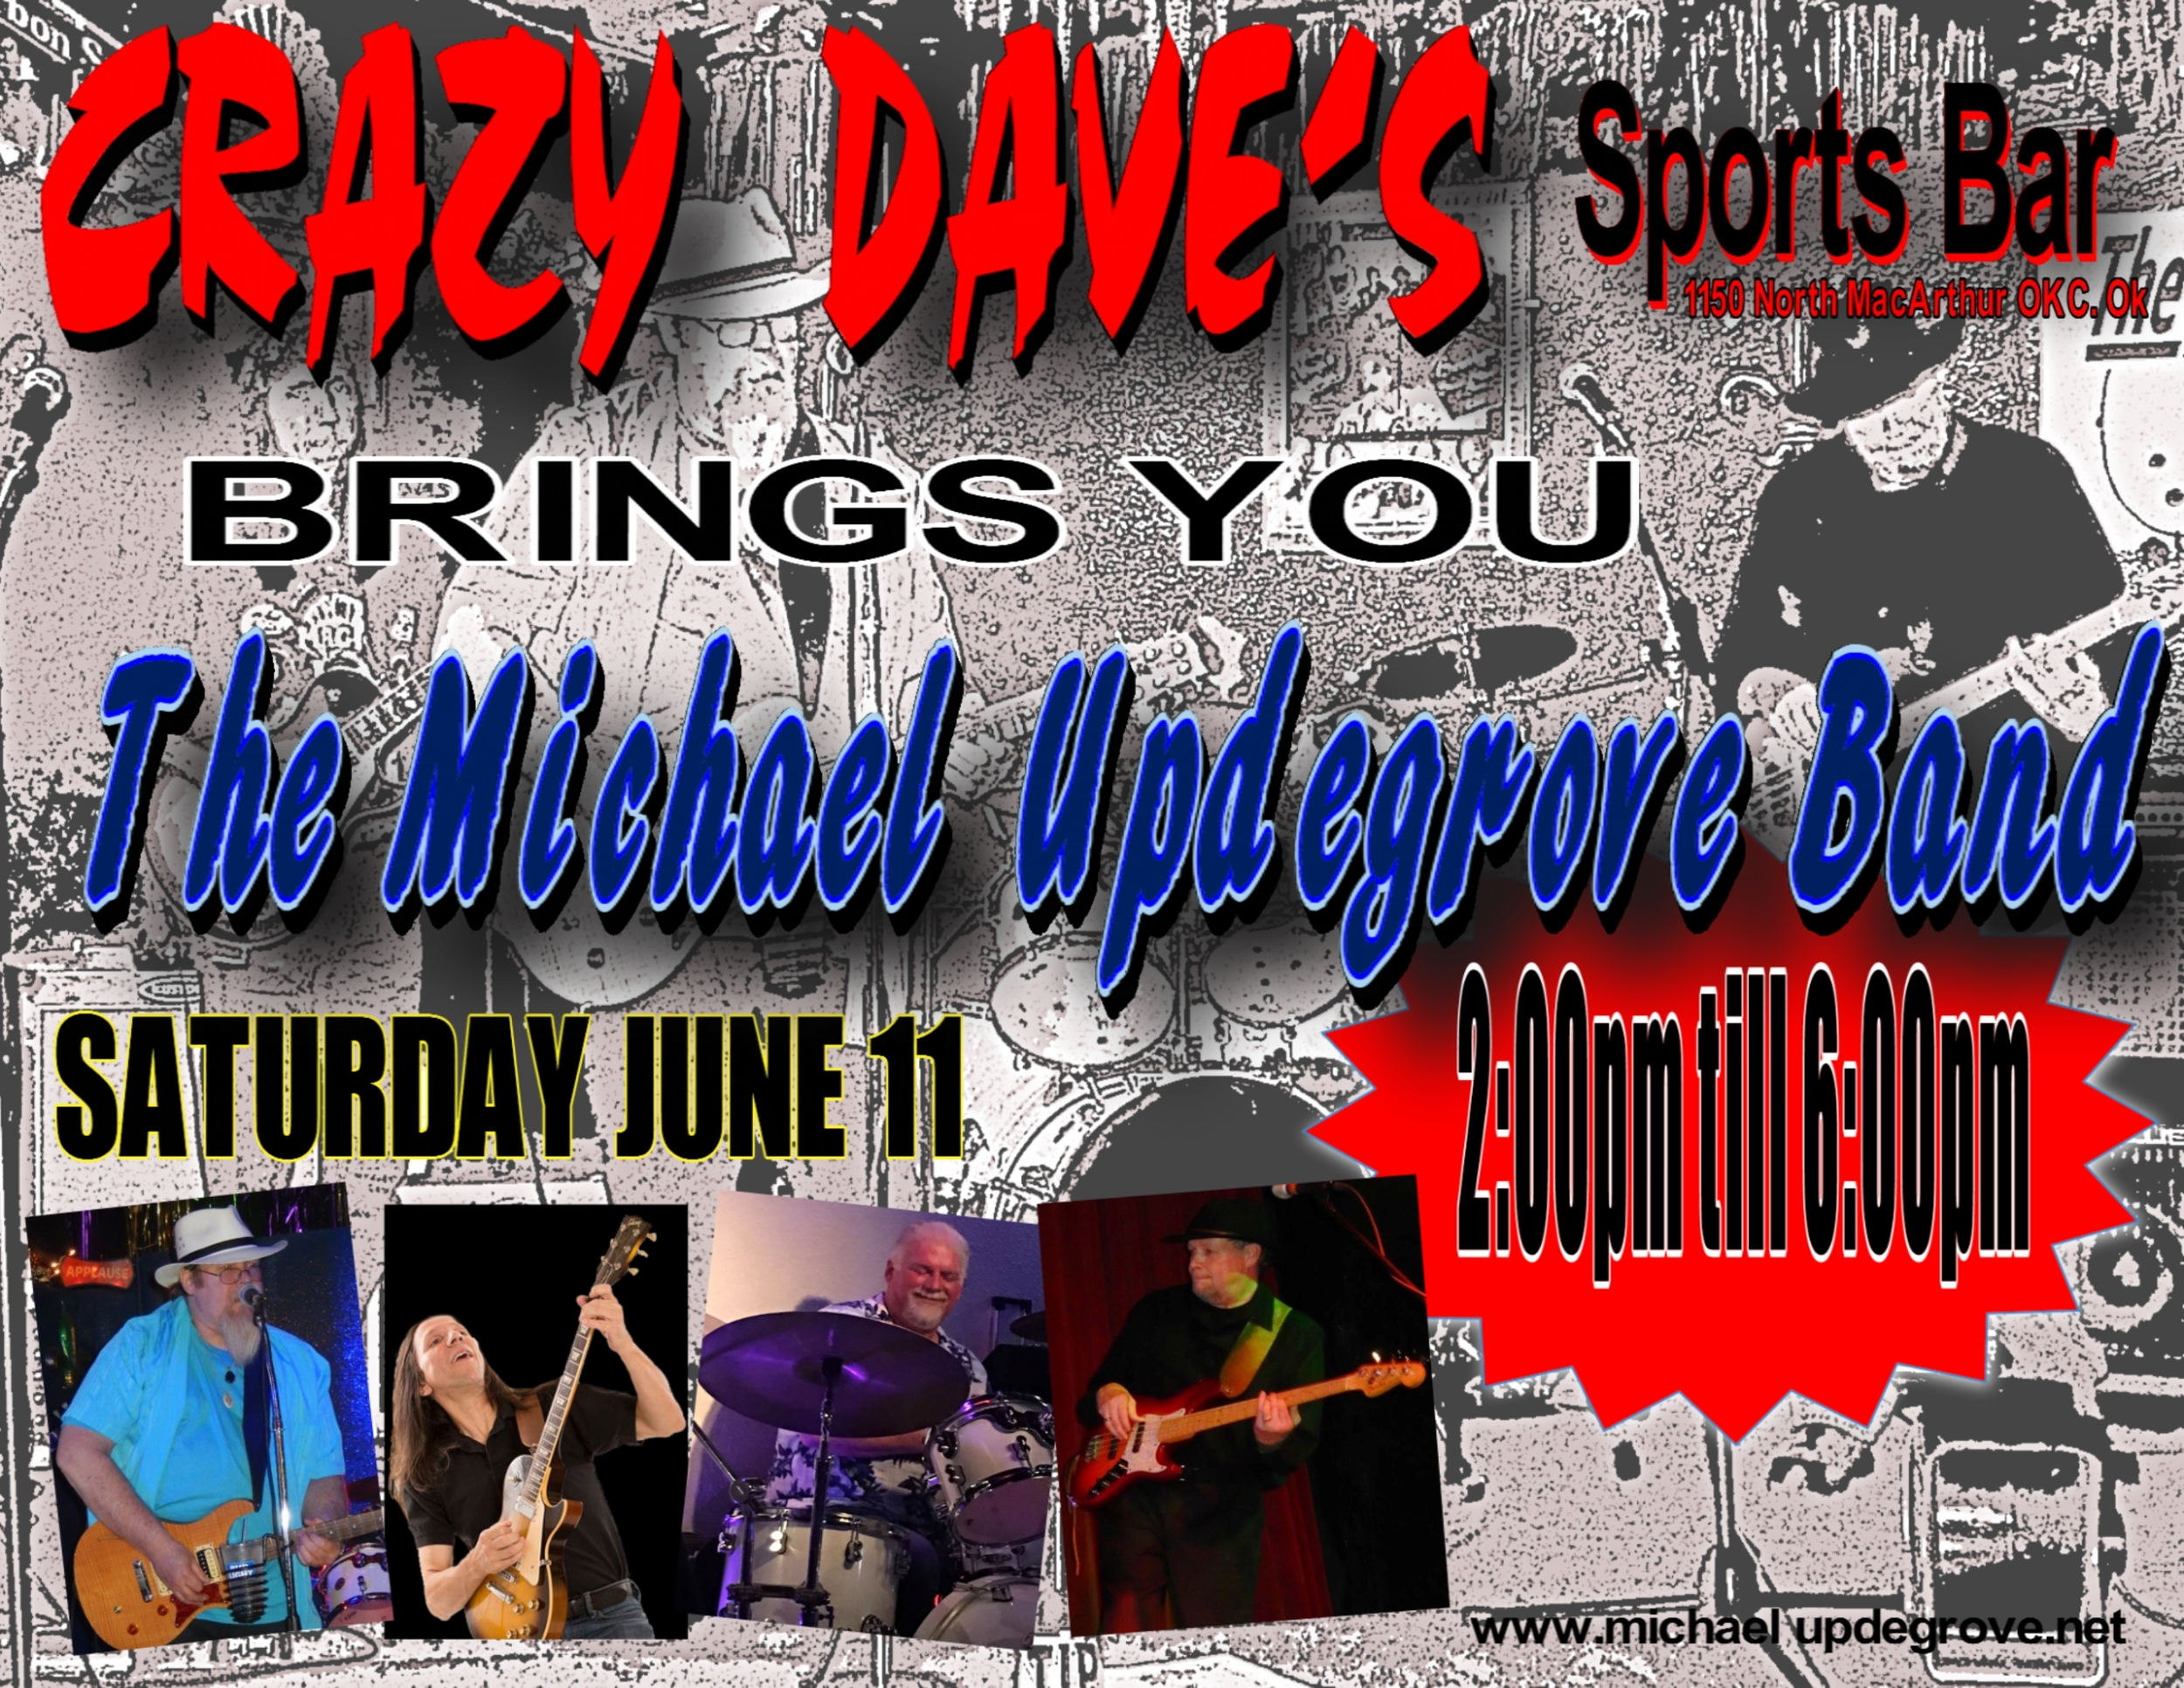 Crazy Dave's Sports Bar.jpg